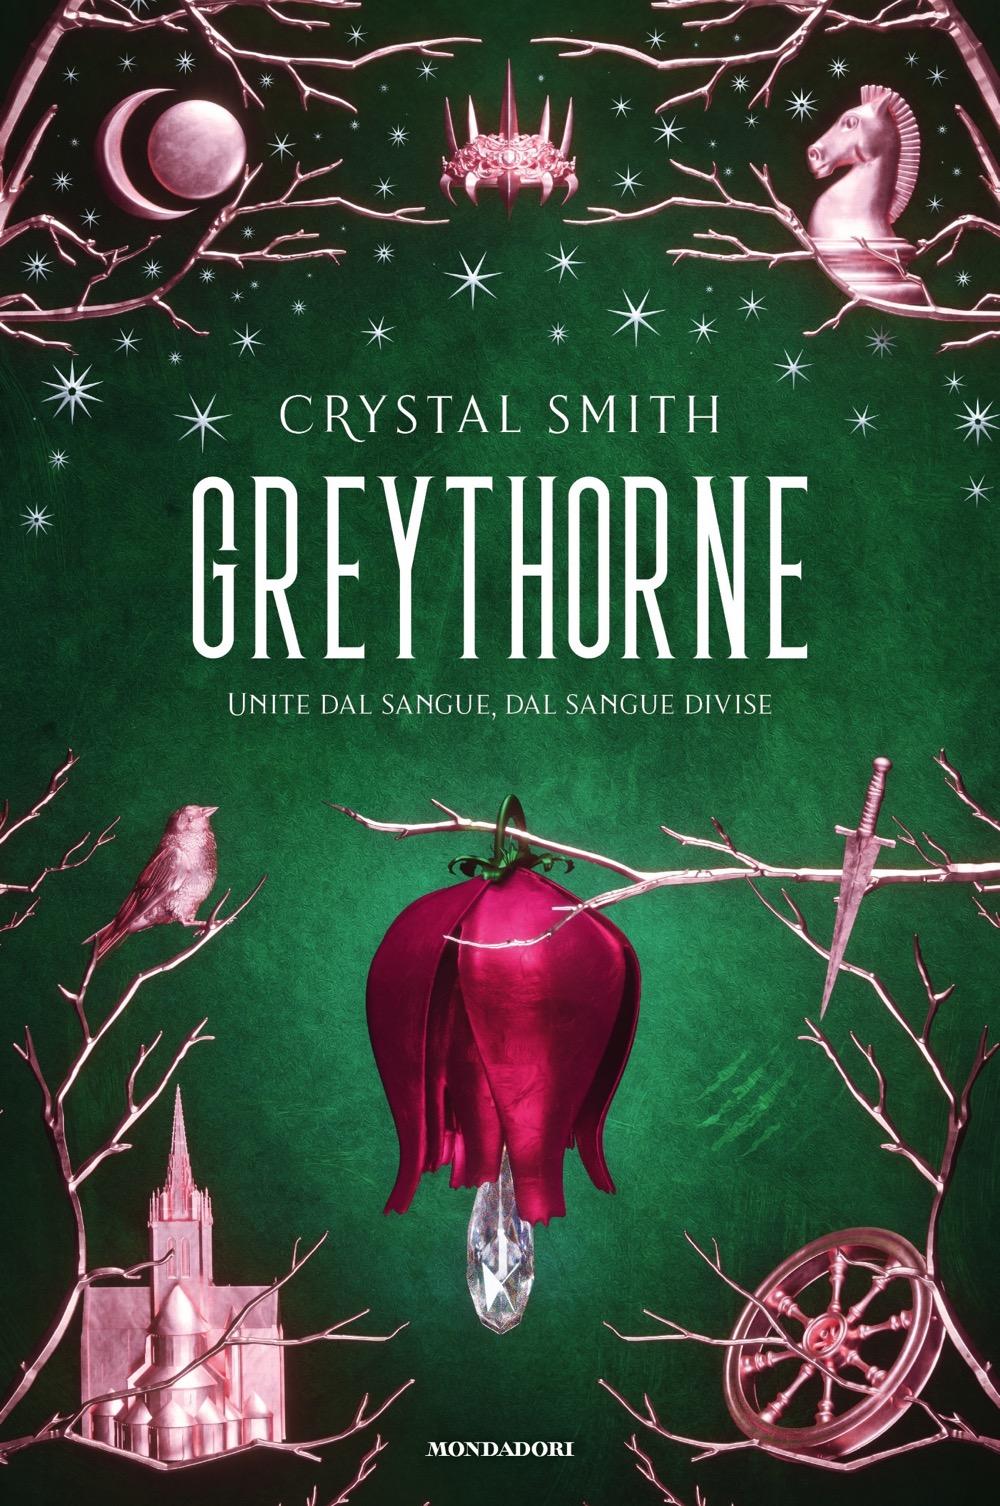 Greythorne - Crystal Smith | Libri Mondadori